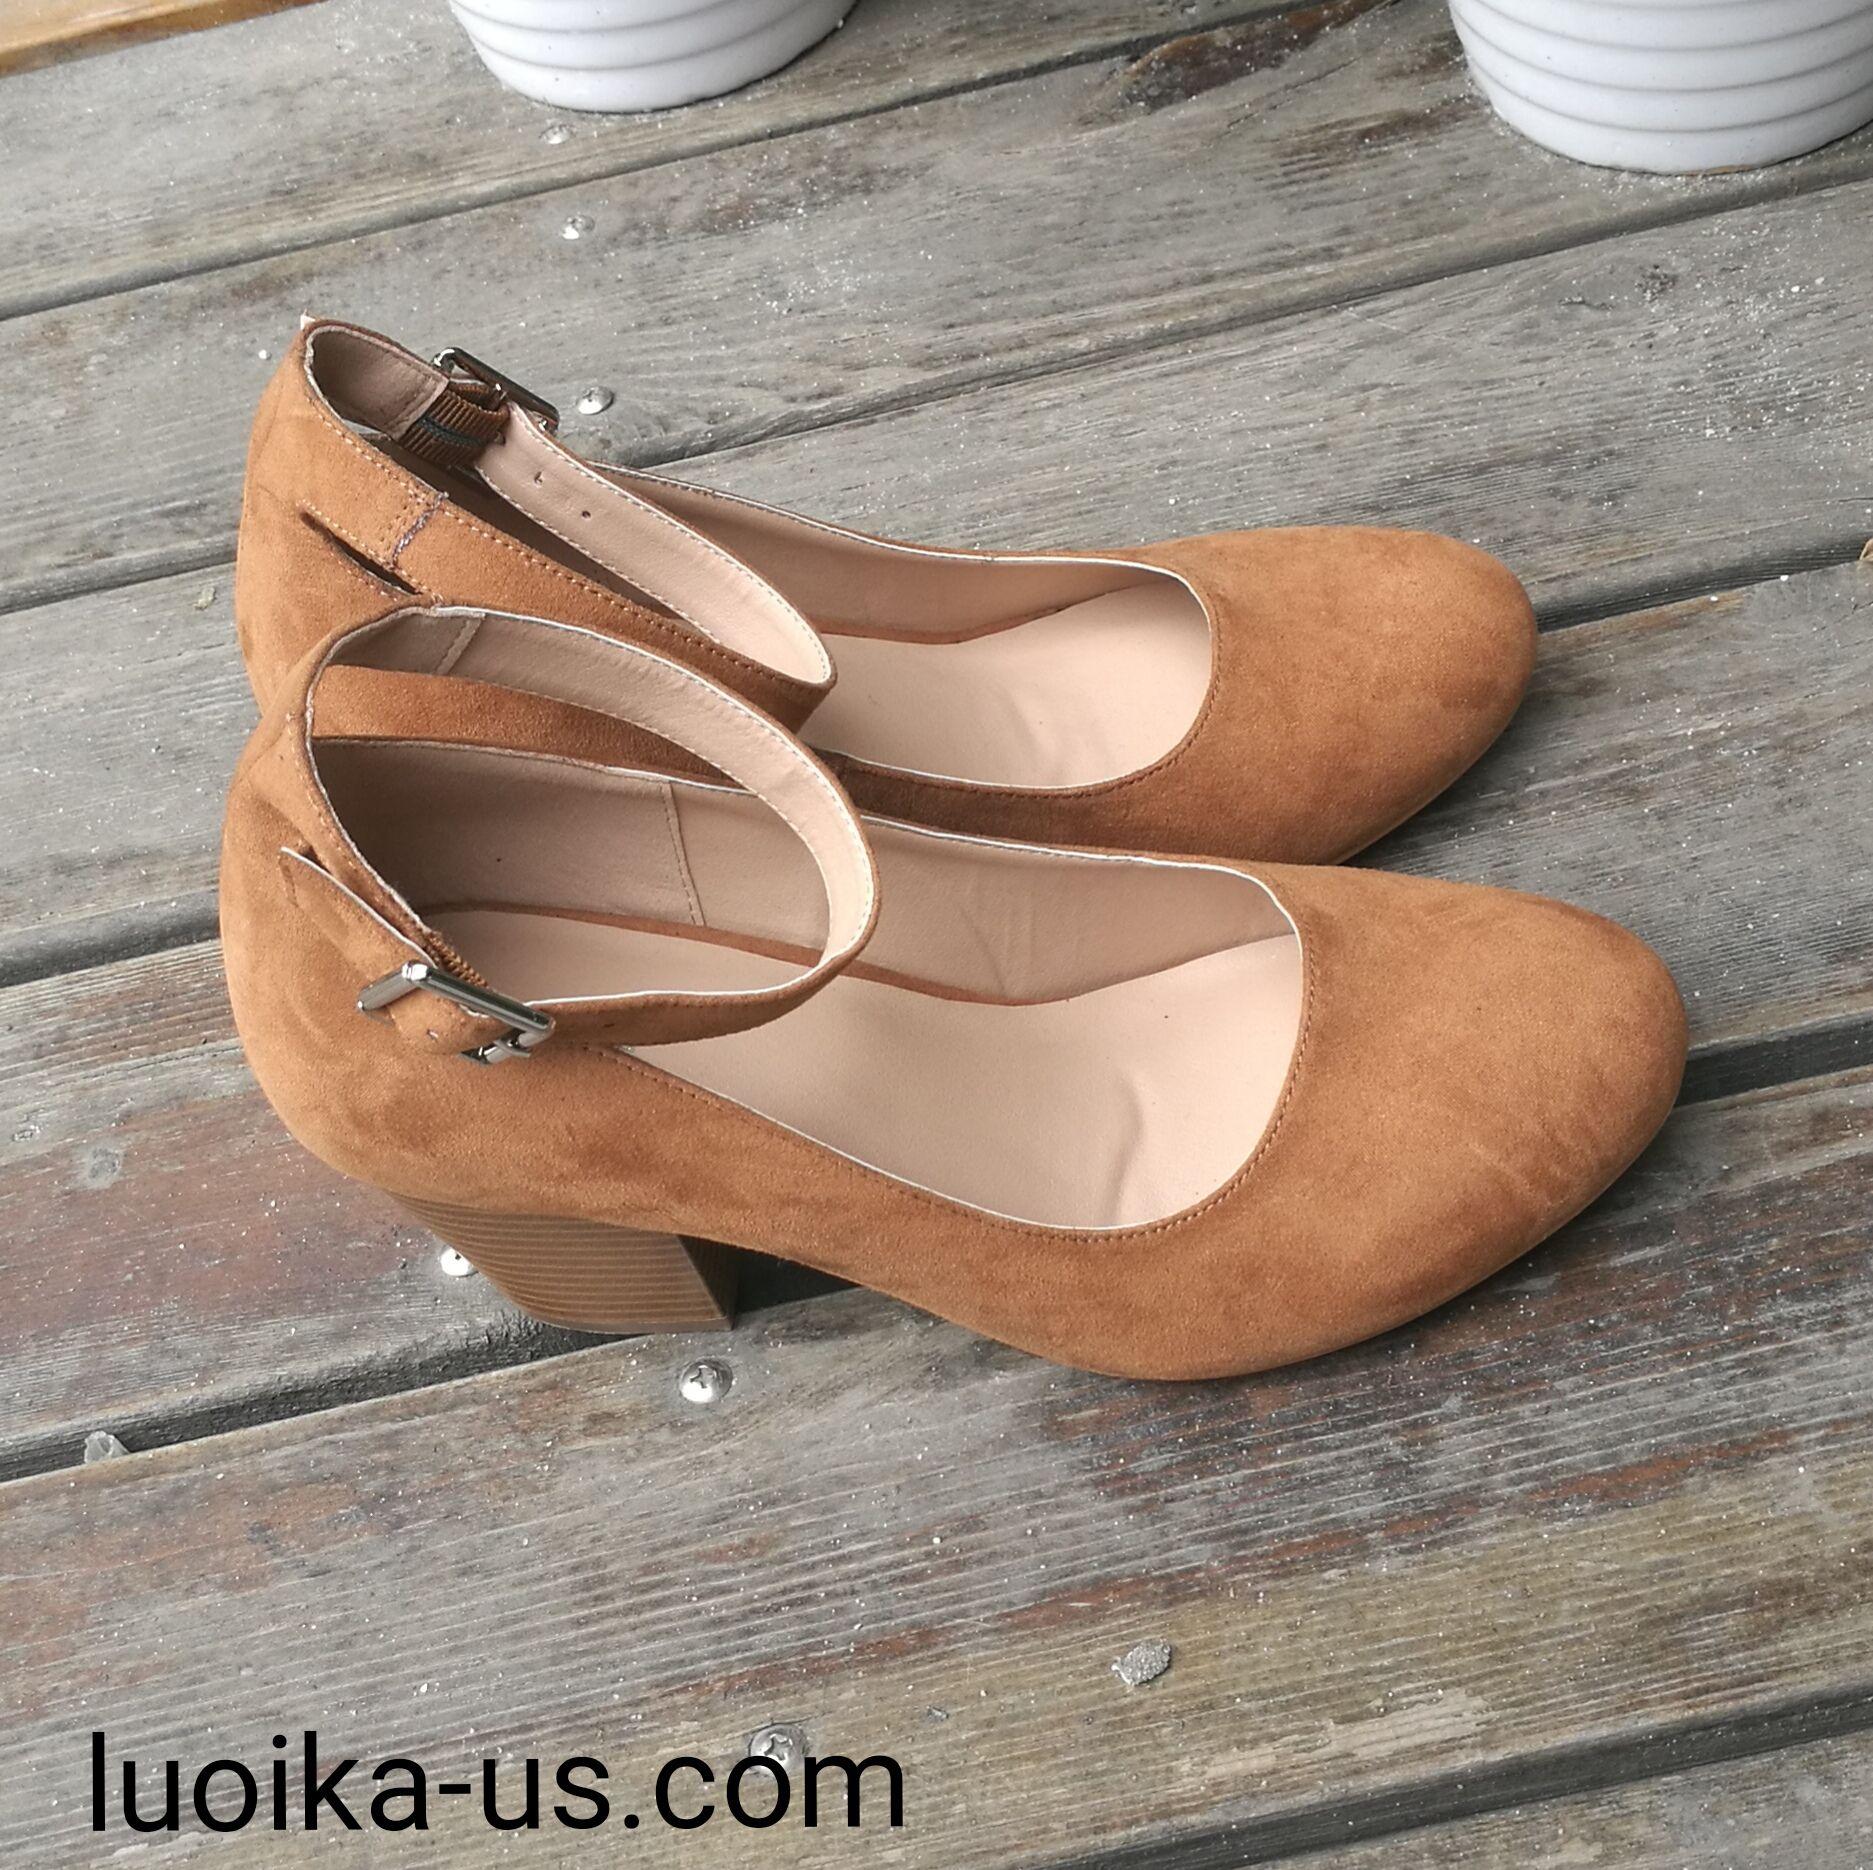 472dc52f5f737 Luoika Women's Wide Width Heel Pump - Ankle Buckle Strap Round ...